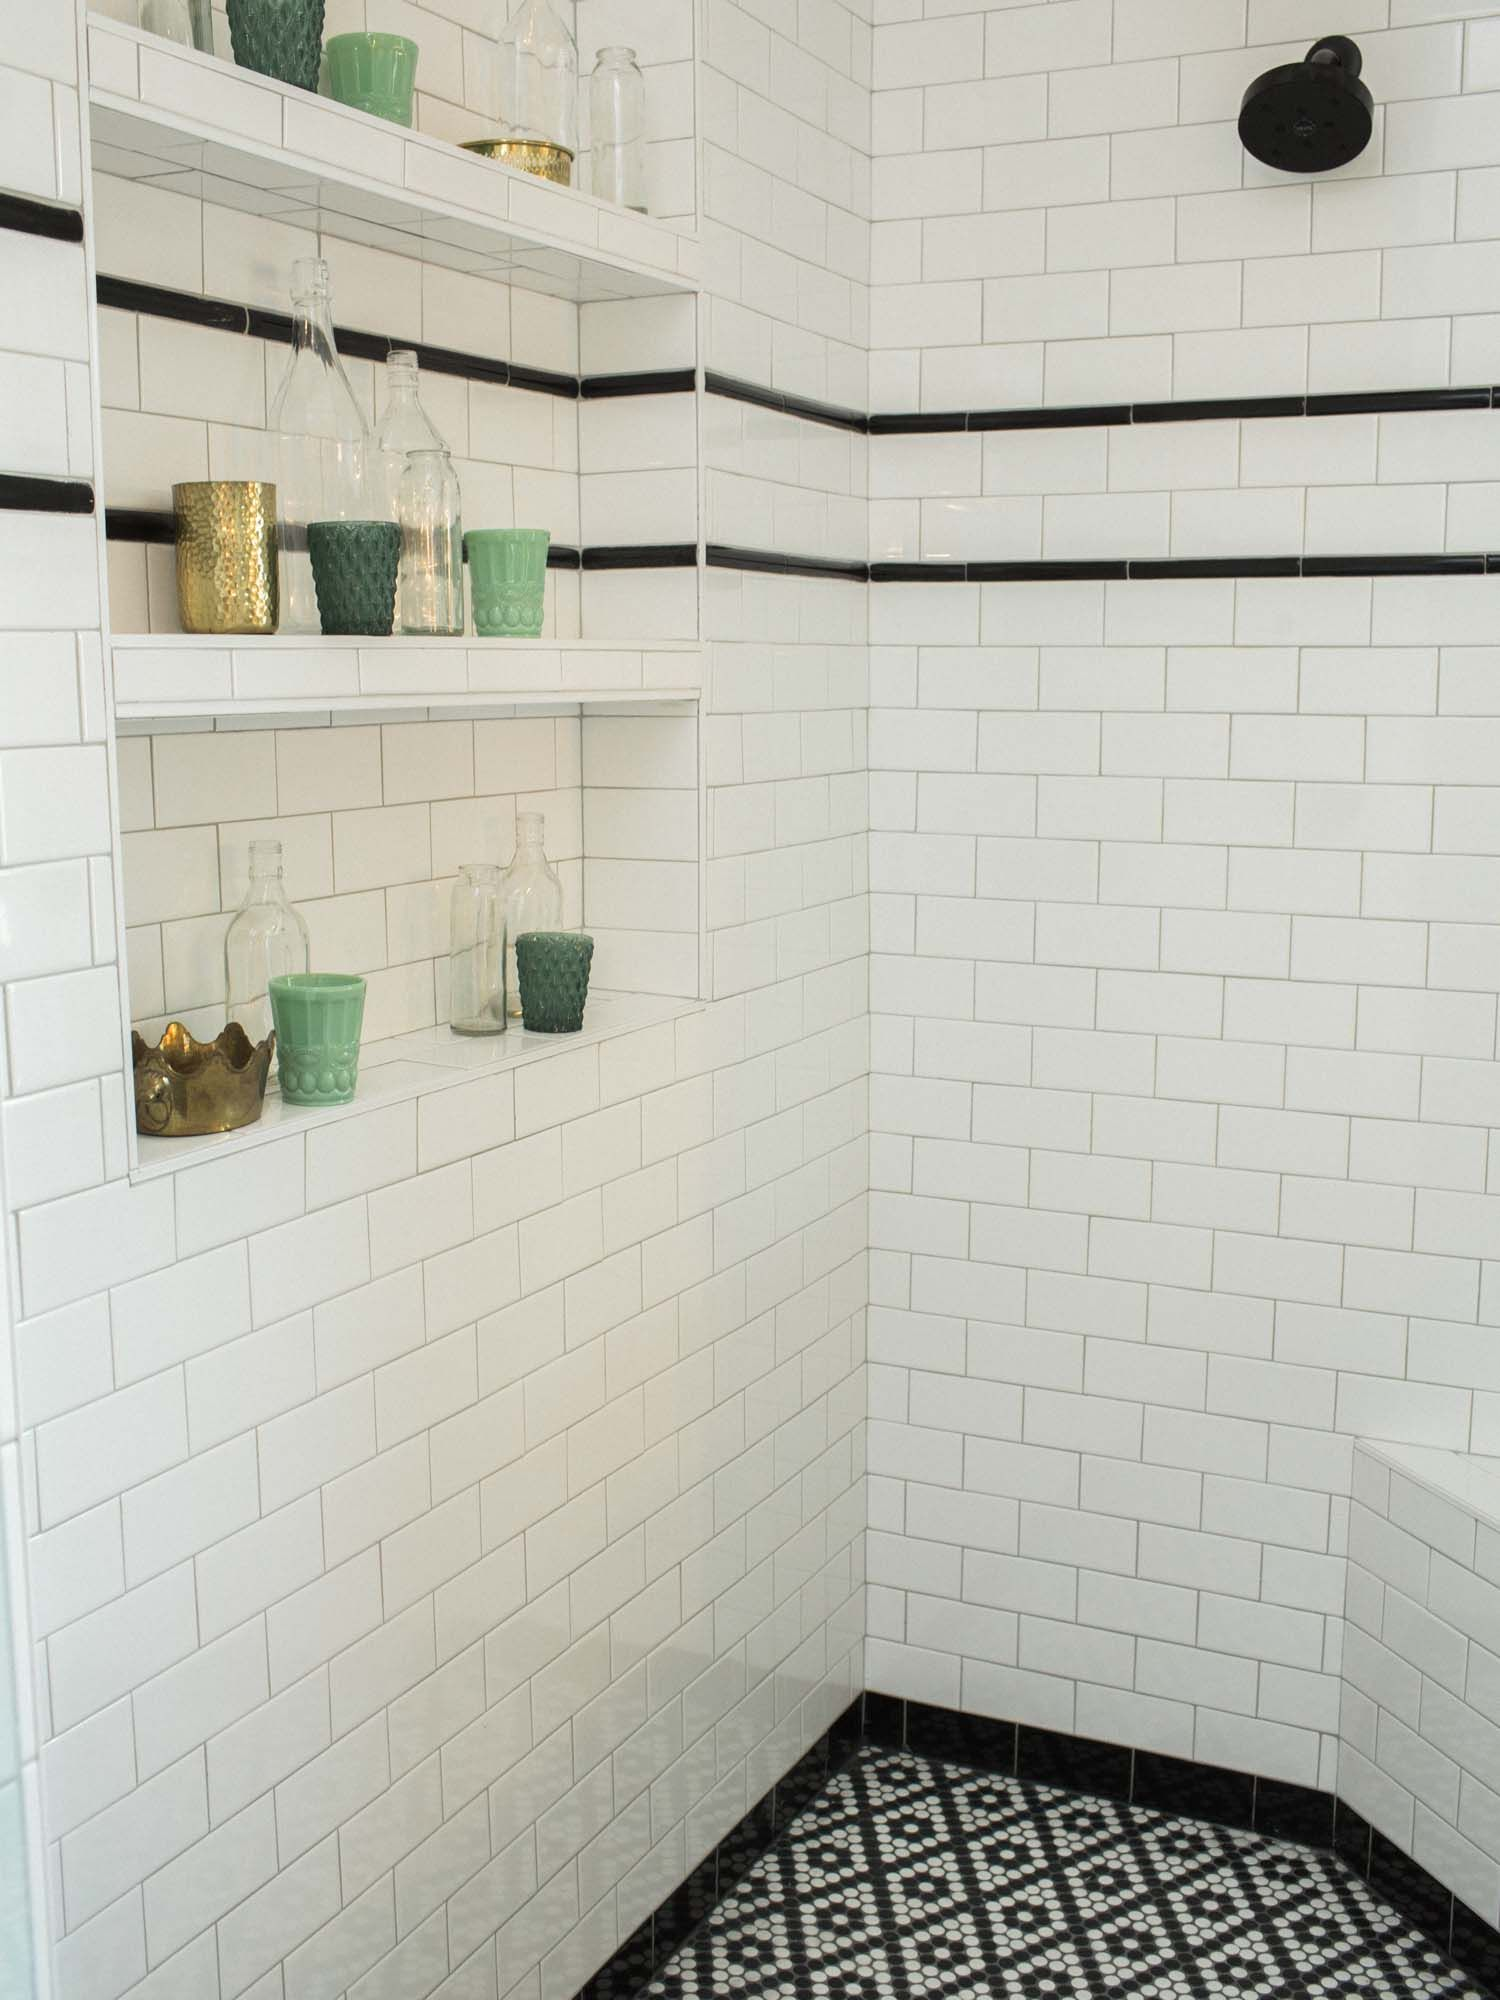 White Subway Tile With Black Stripe Shower Inspiration With Shelves White Bathroom Tiles White Tile Shower White Subway Tile Shower